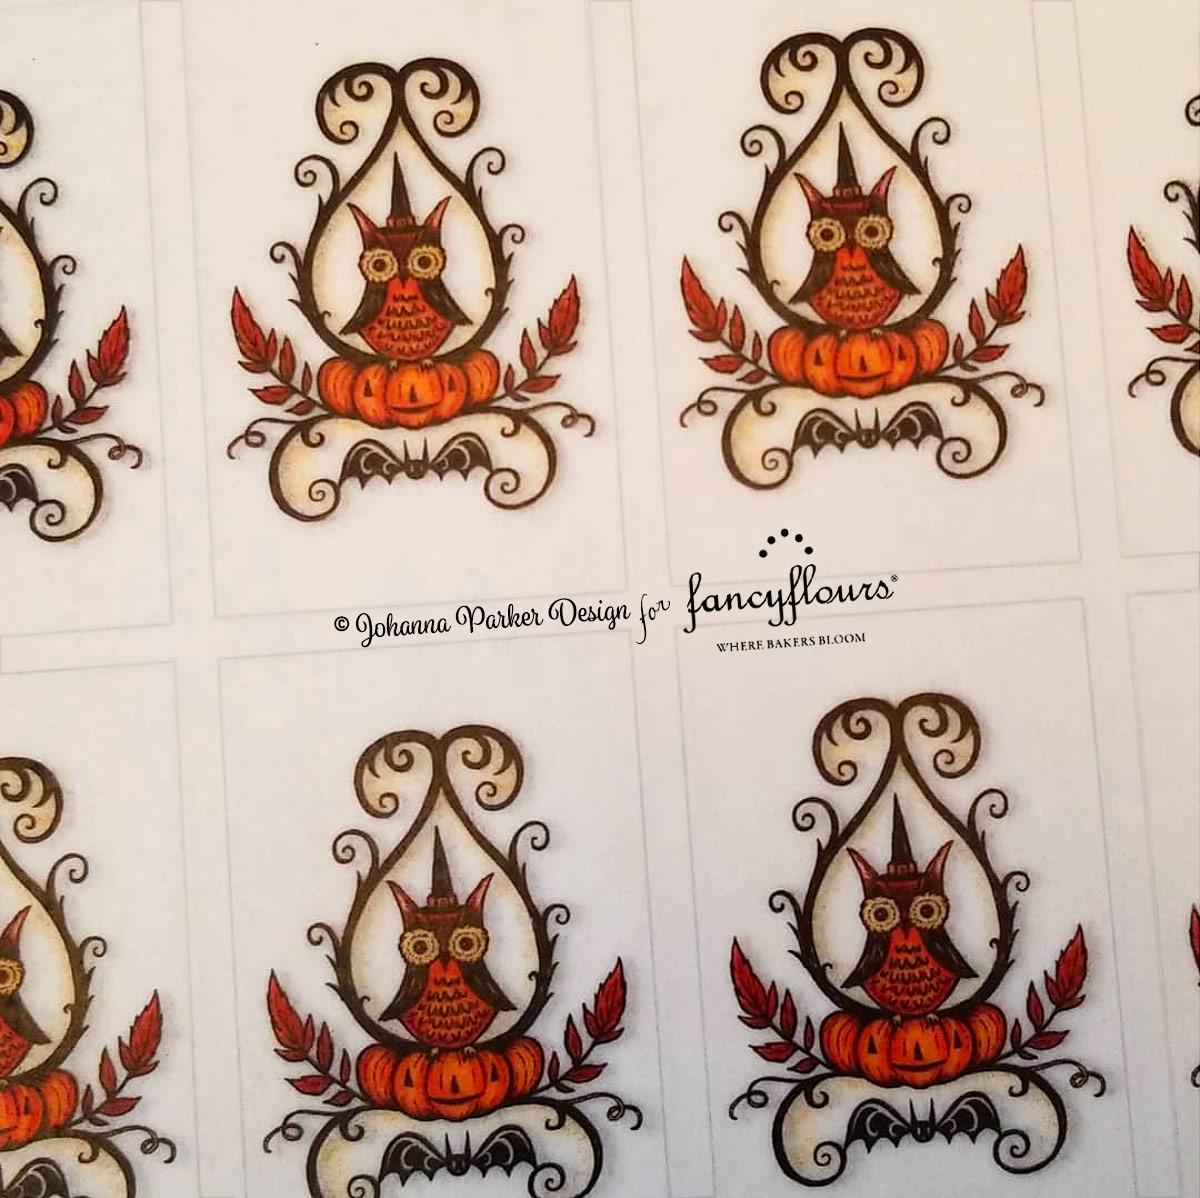 JPD Partners in Craft * Fancy Flours + Johanna Parker Design * Collaboration